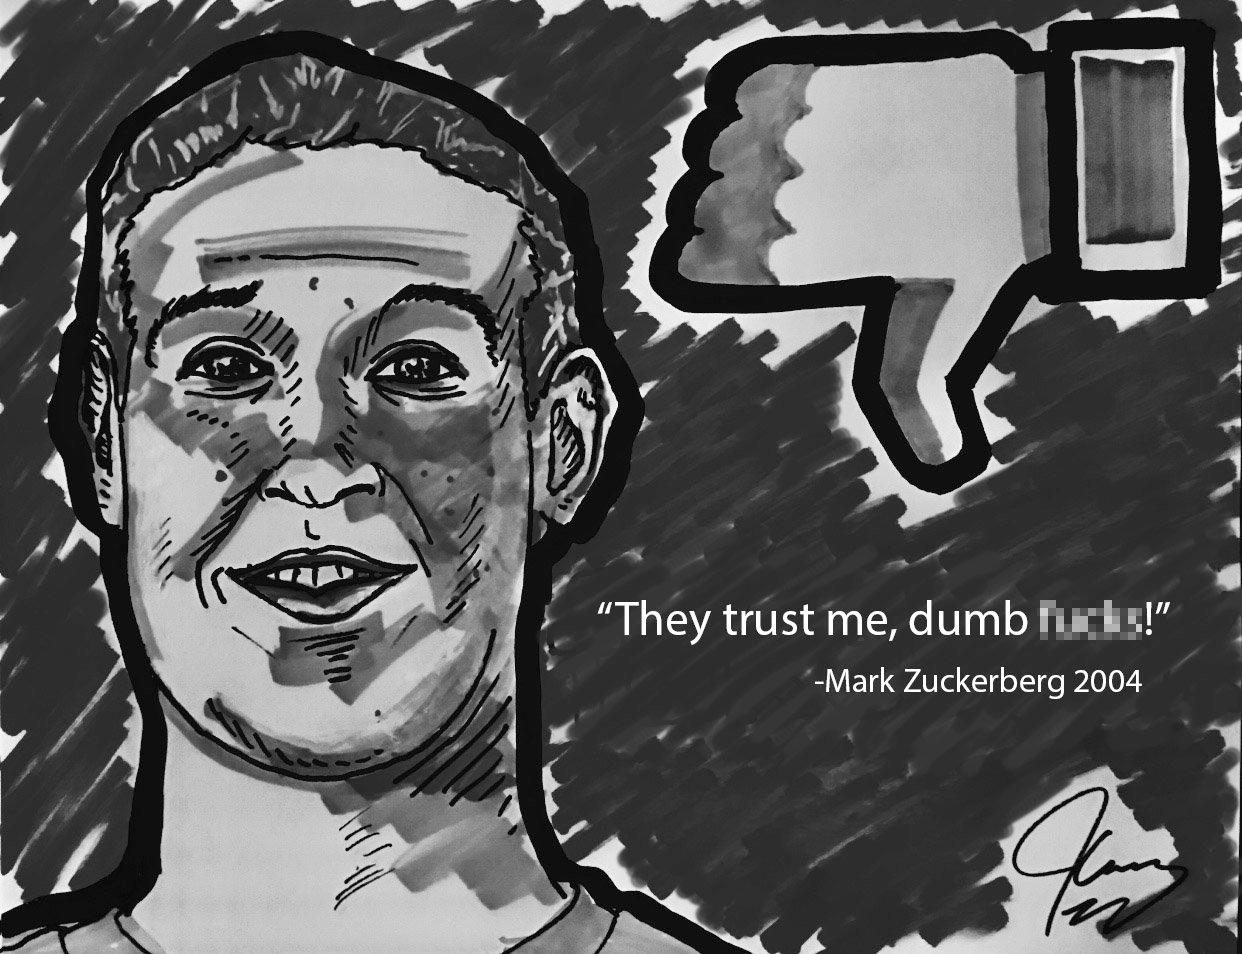 Publishers: Let's Get Real About Regulating Facebook - Folio: